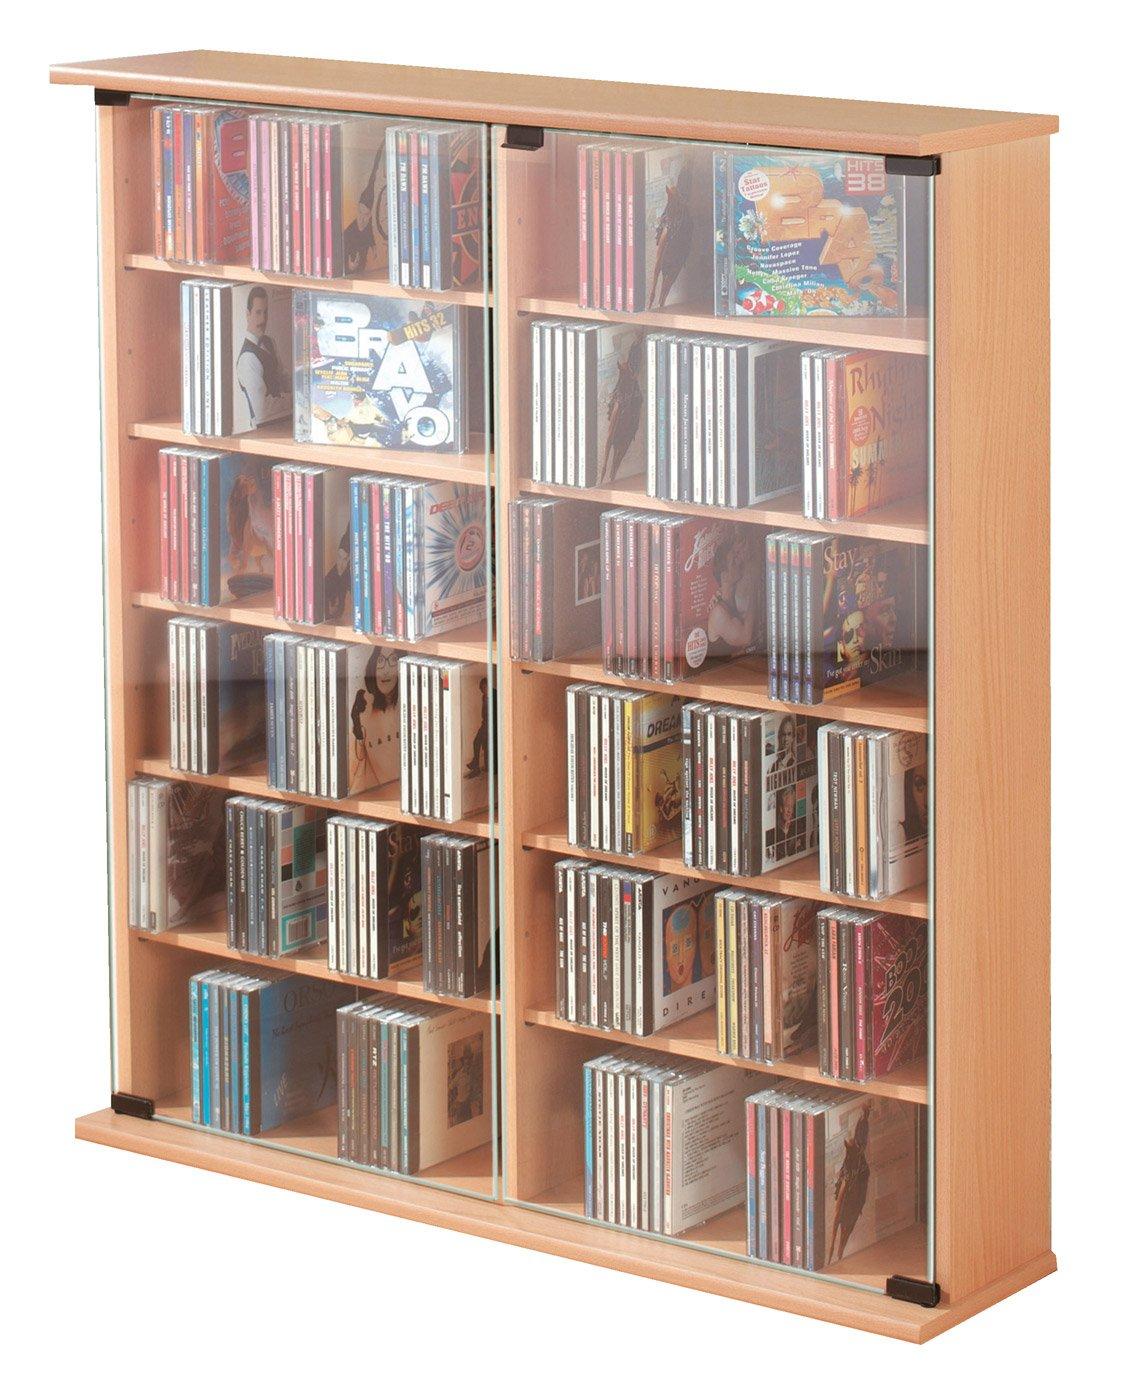 VCM 50403 VCM CD/DVD-Turm für